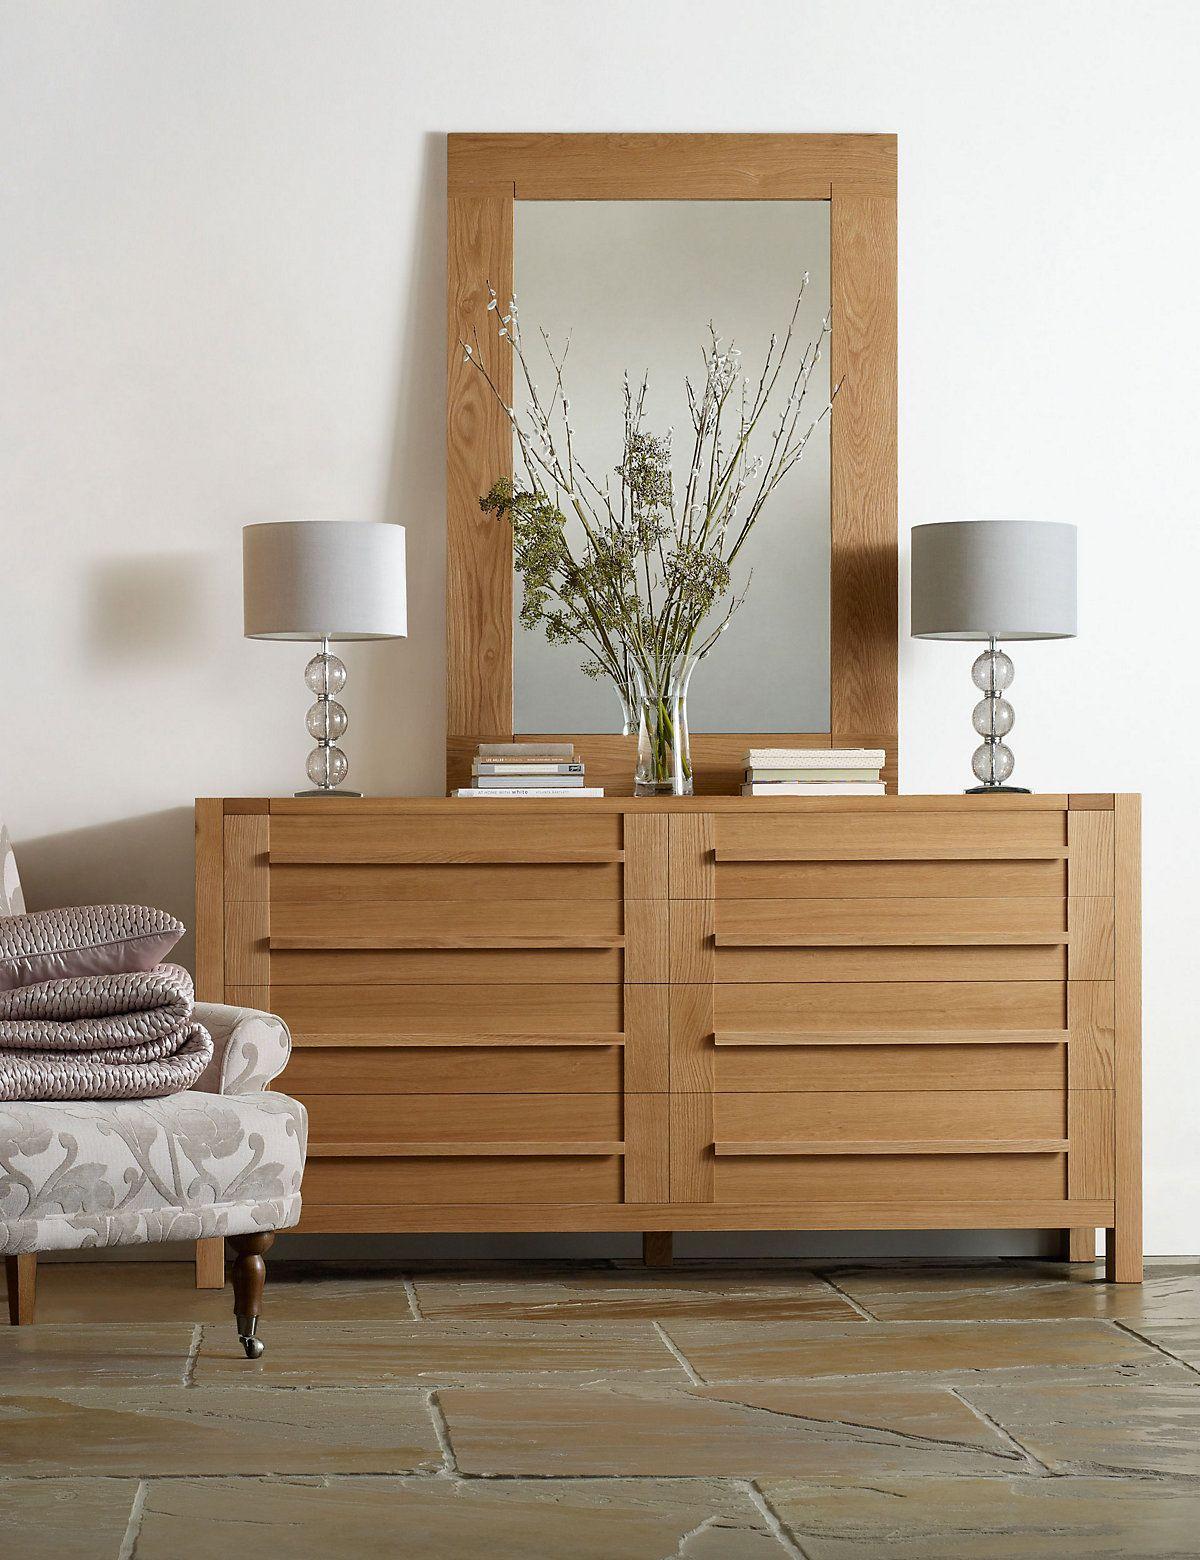 M&S Sonoma light (8-drawer dresser) £8 (8cm wide